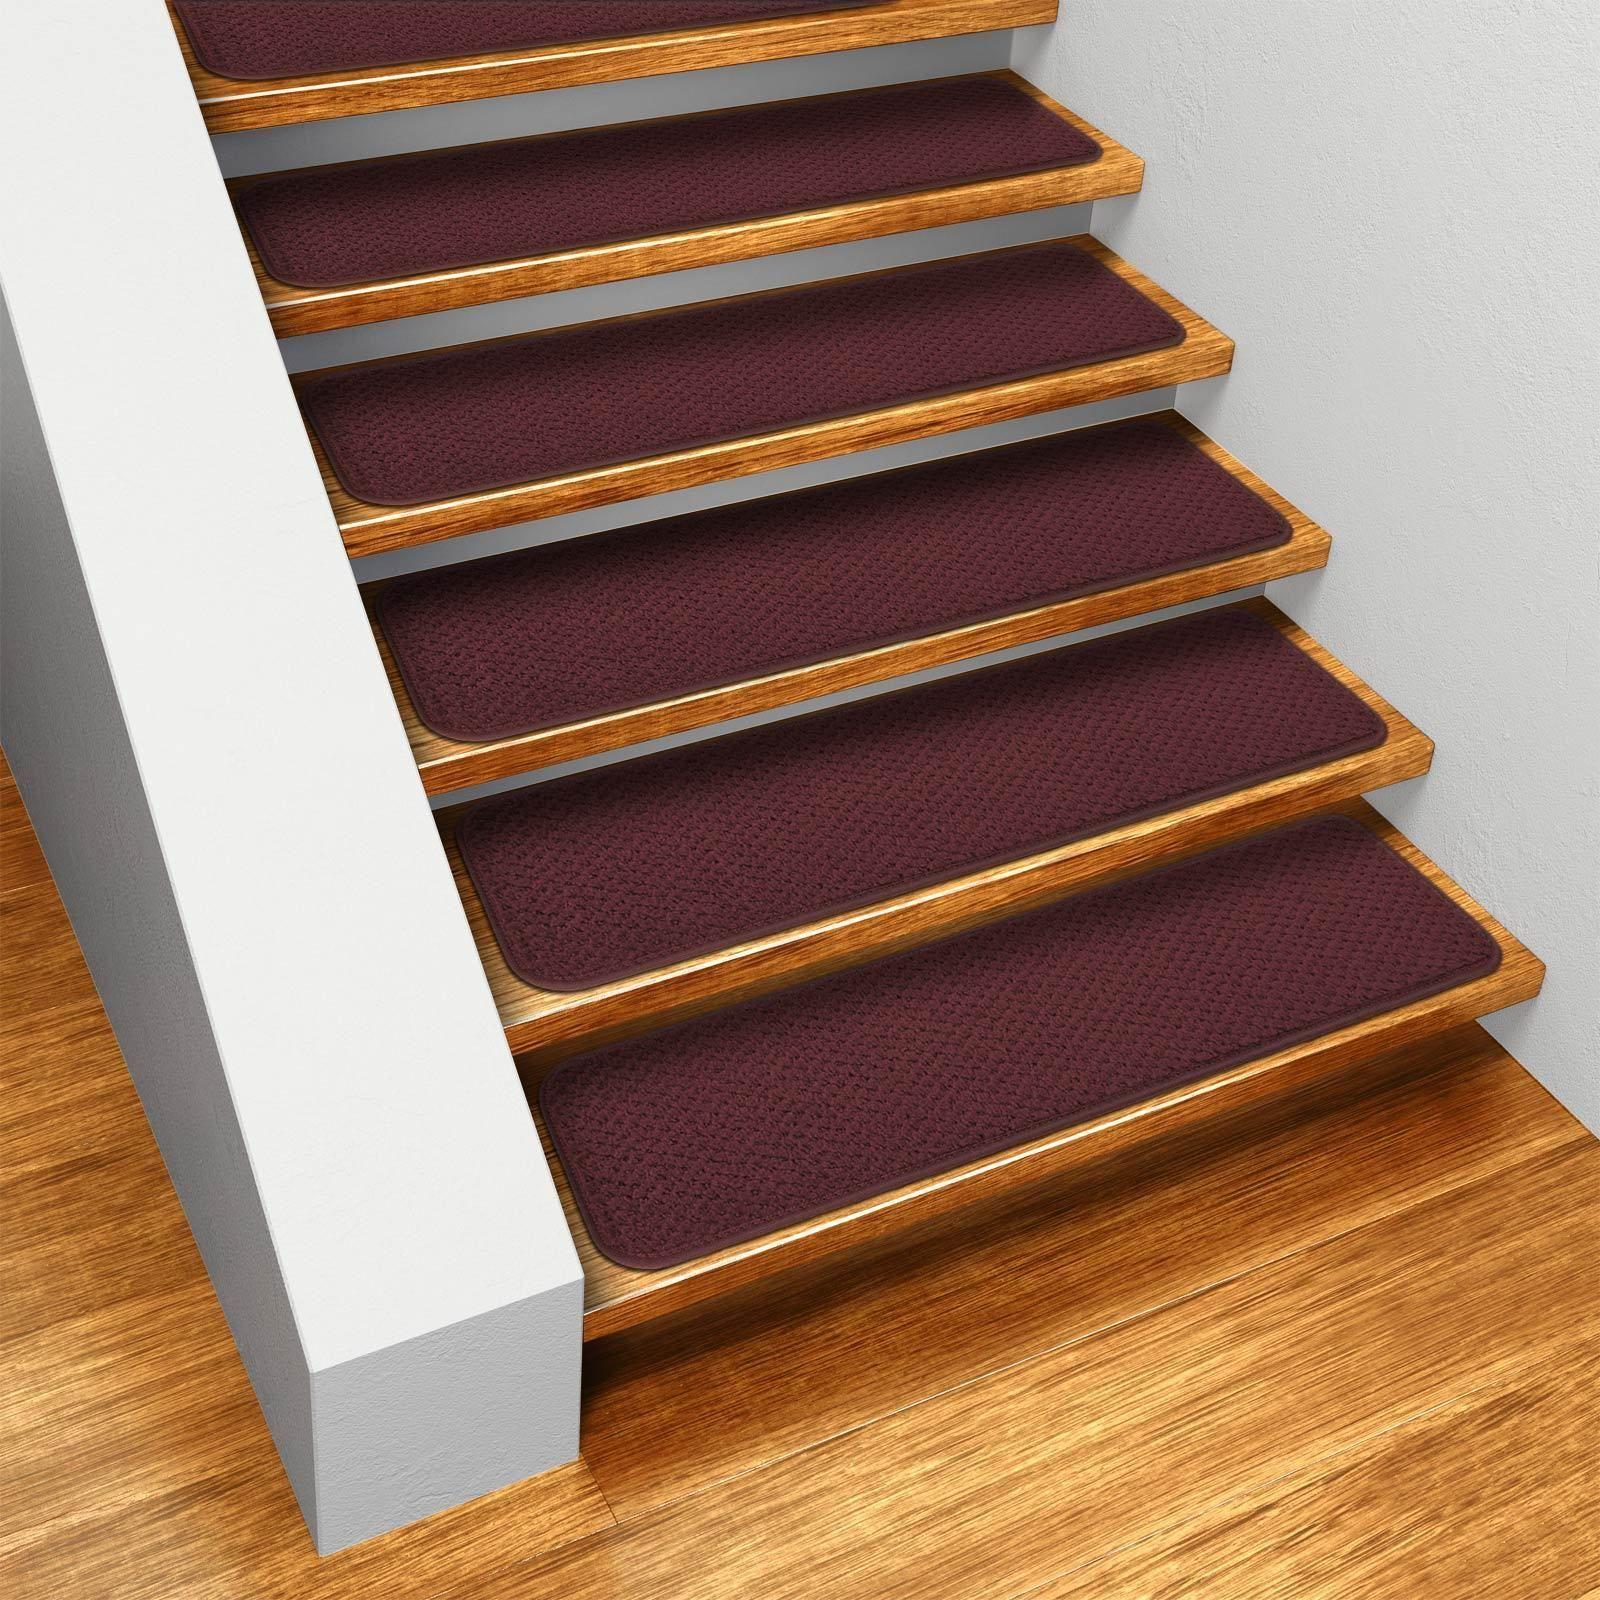 Best Set Of 12 Skid Resistant Carpet Stair Treads Burgundy Red 400 x 300